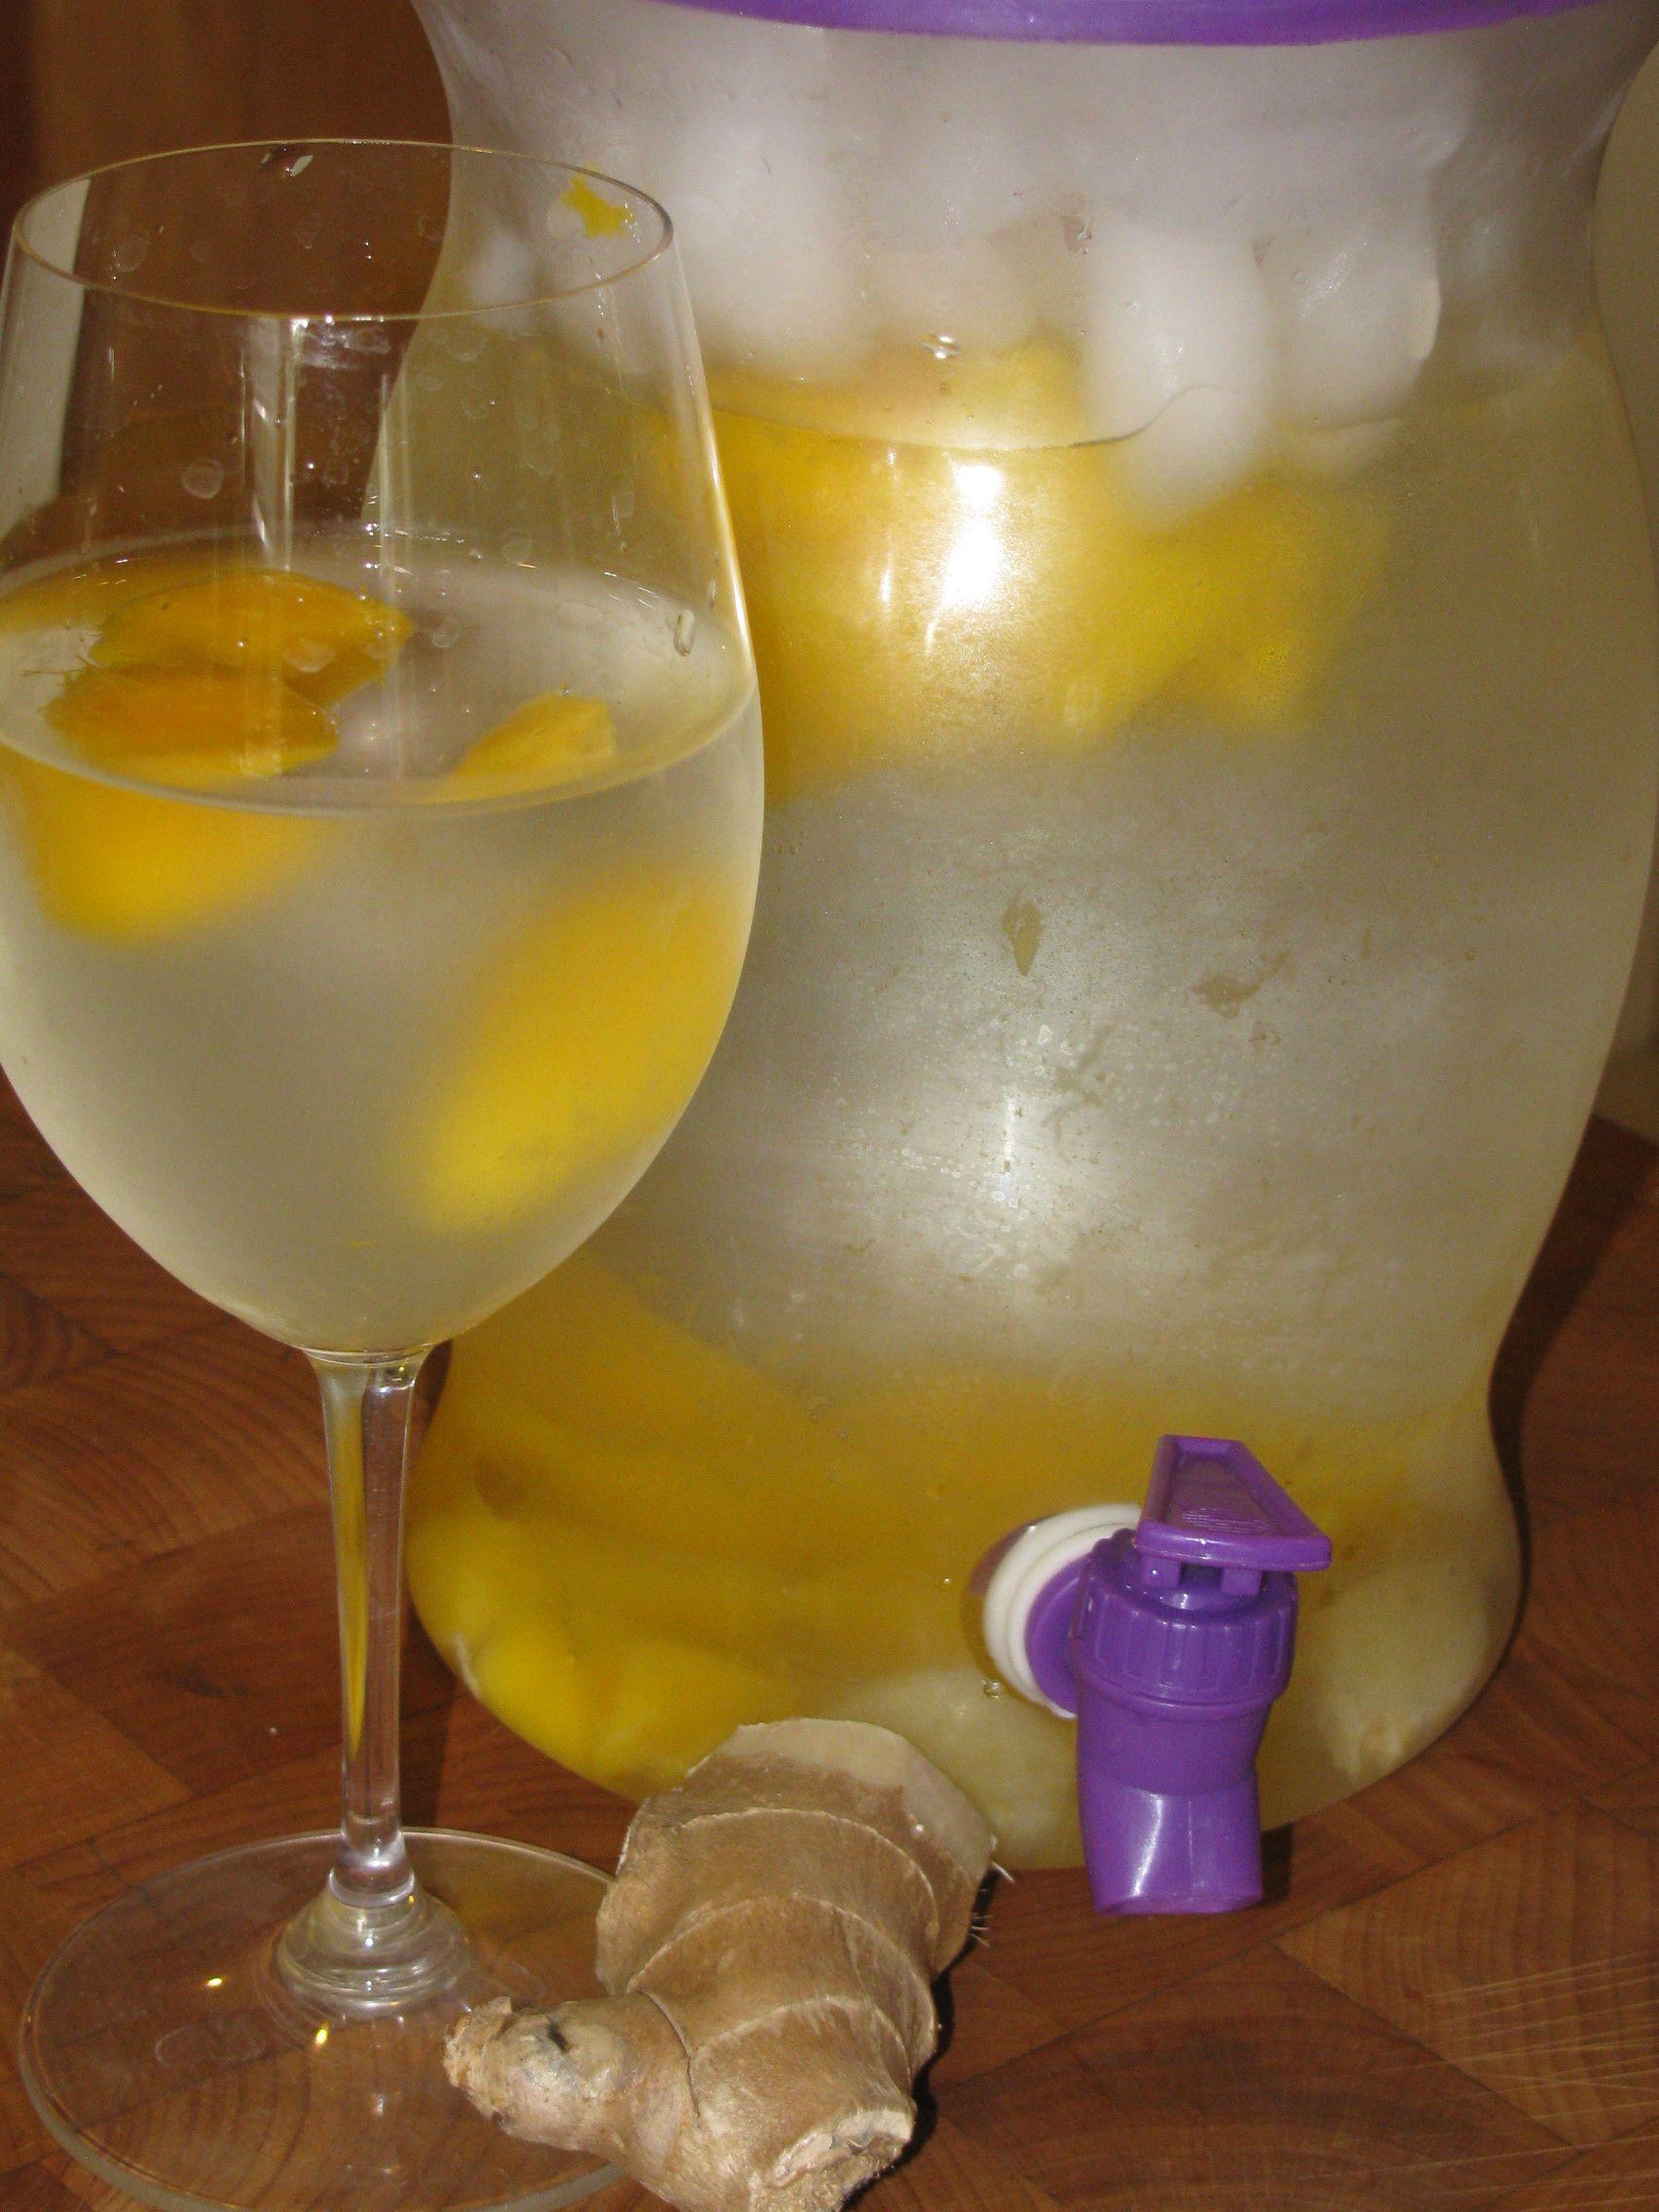 Day Spa Mango Ginger Water ZERO CALORIES